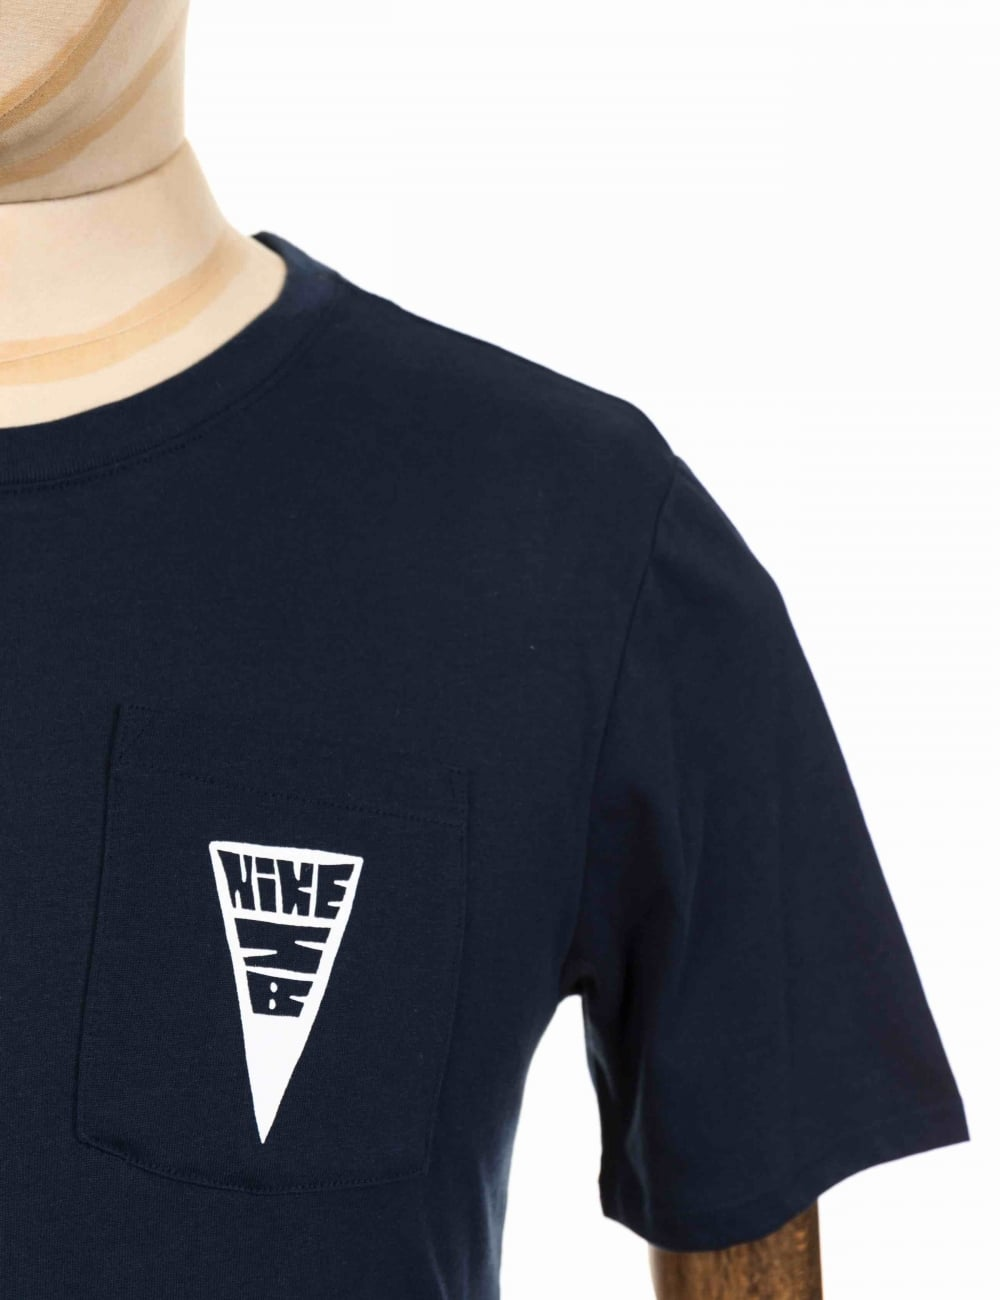 Dry Fit Triangle Pocket Logo Tee Obsidian